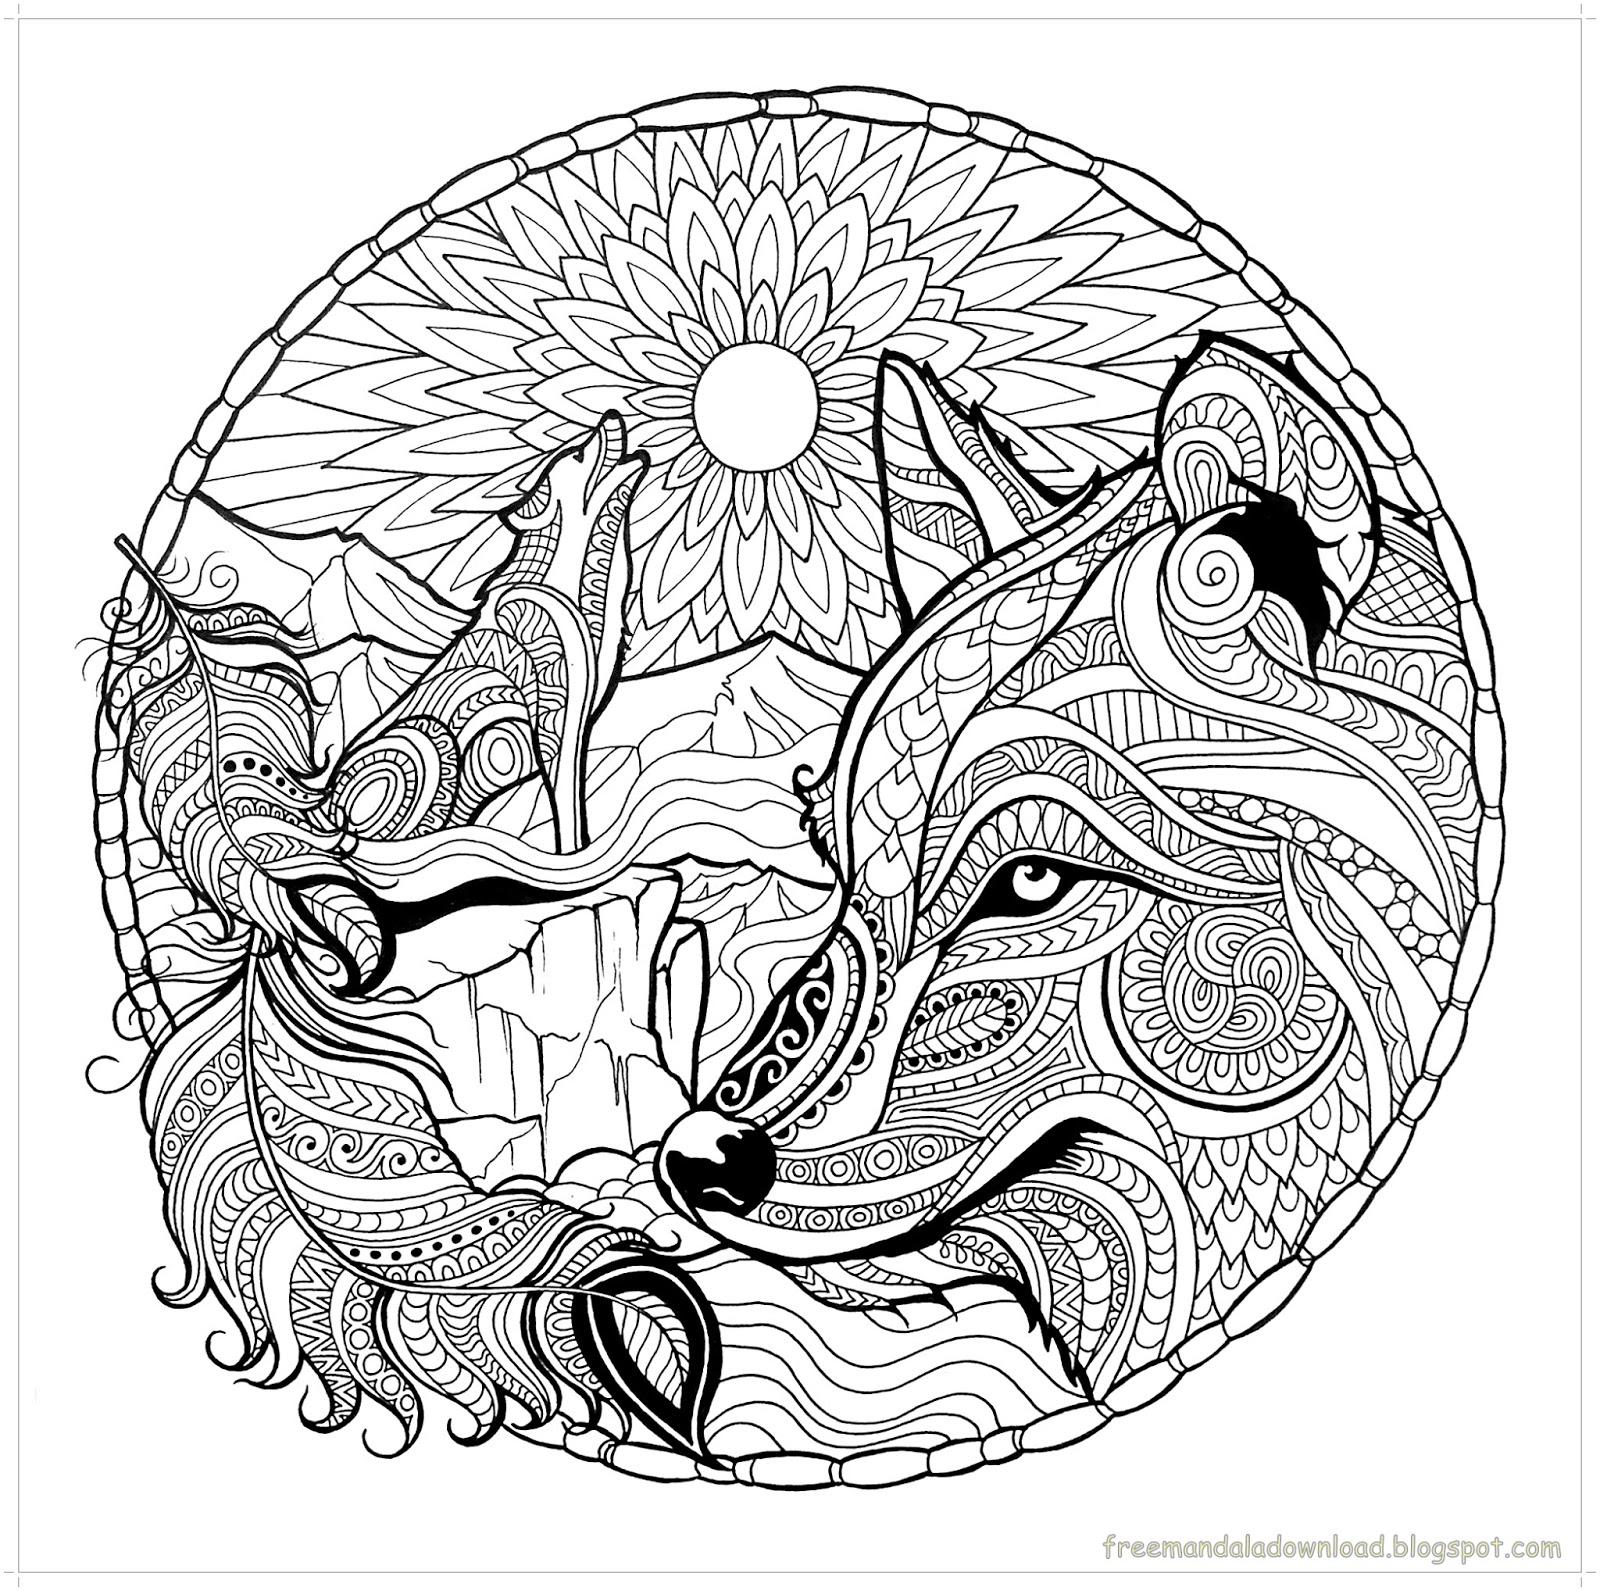 Malvorlagen Wolf-Mandala-hohe QualitätWolf mandala